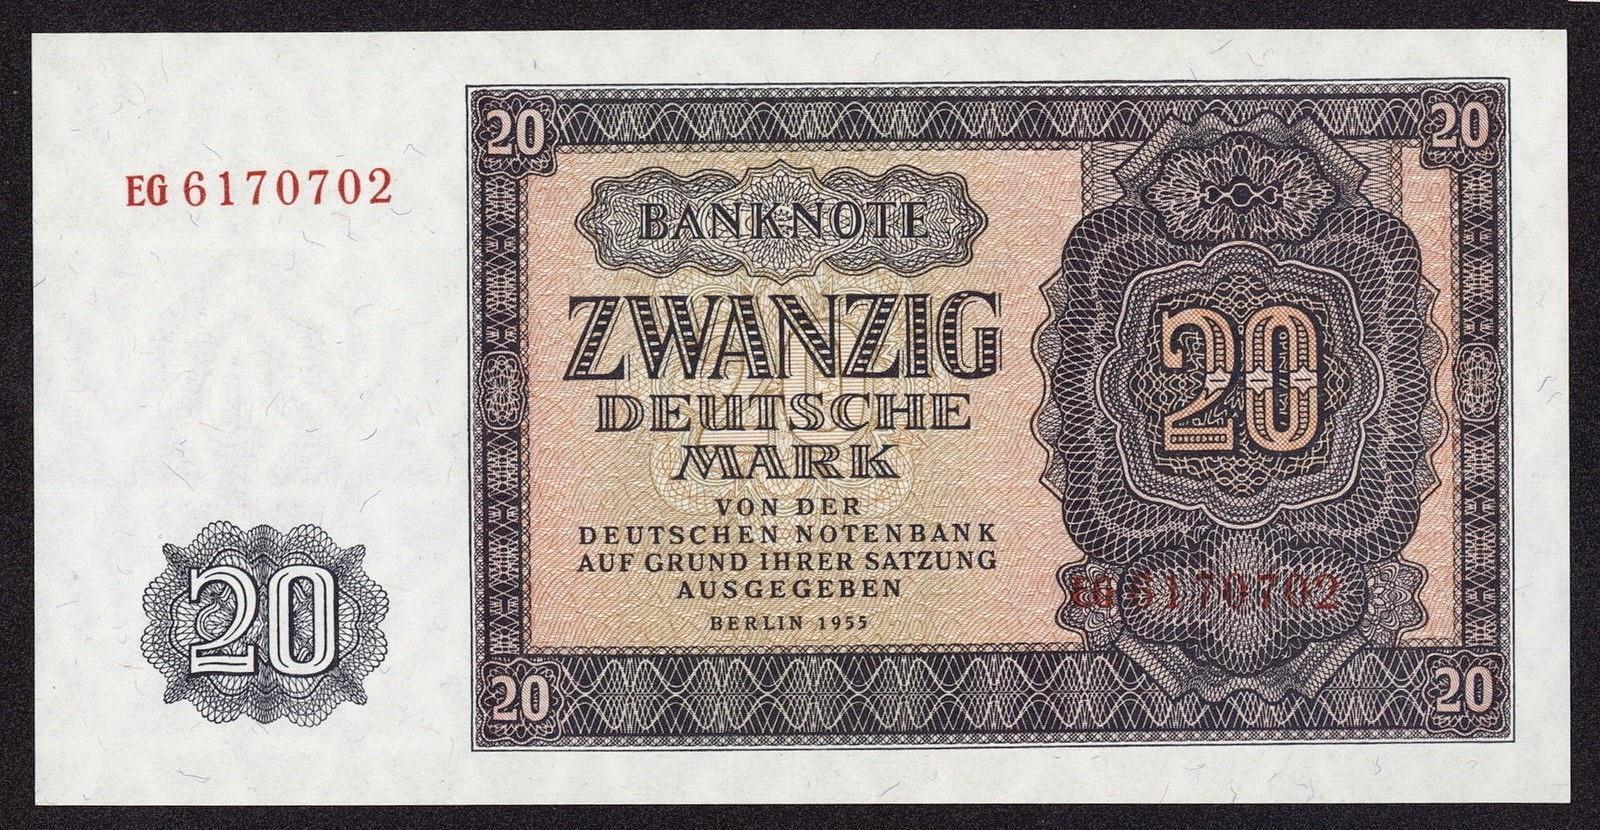 East Germany Ddr 20 Deutsche Mark 1955 World Banknotes